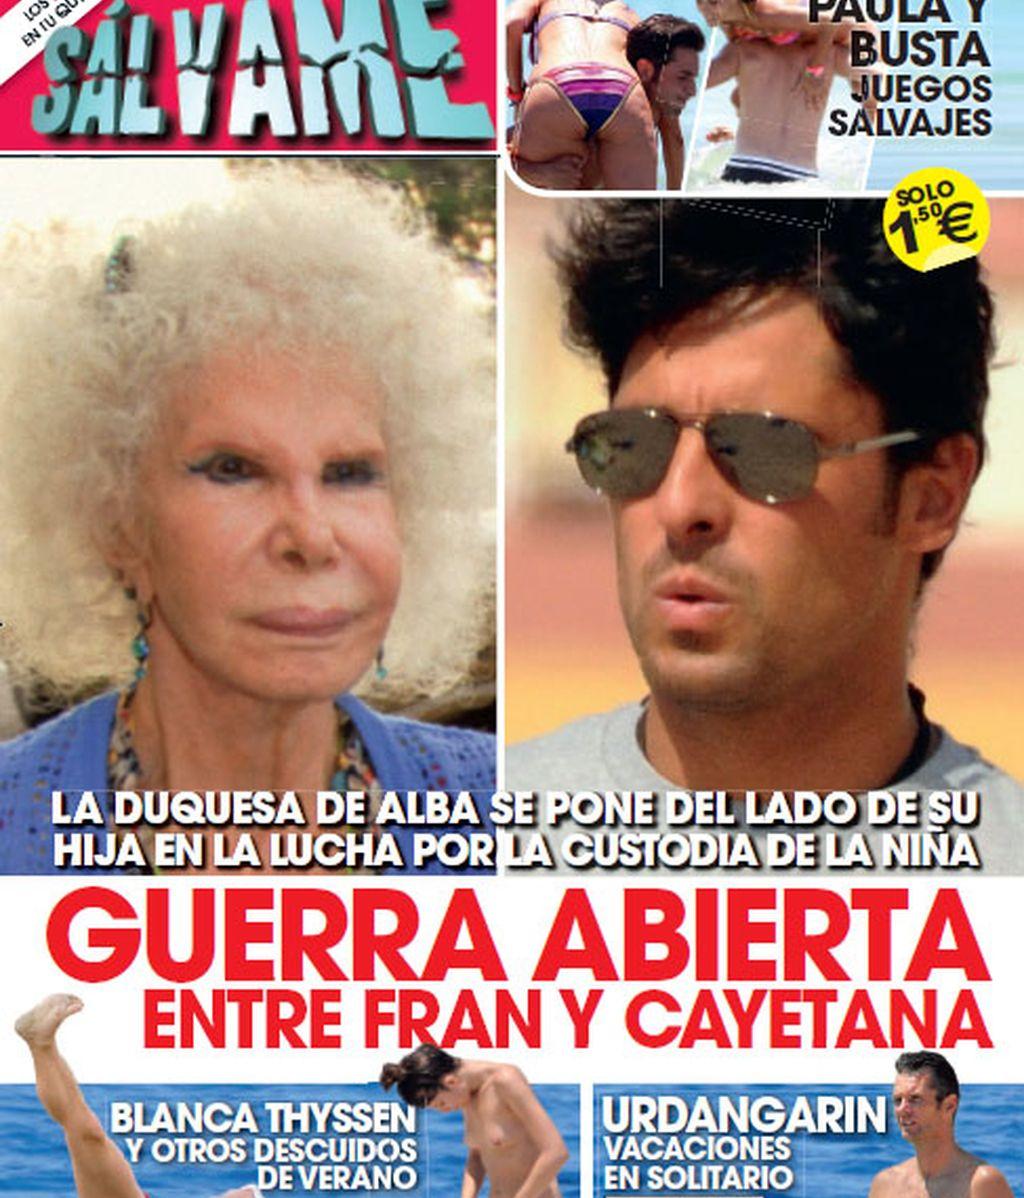 Revista 'Sálvame'